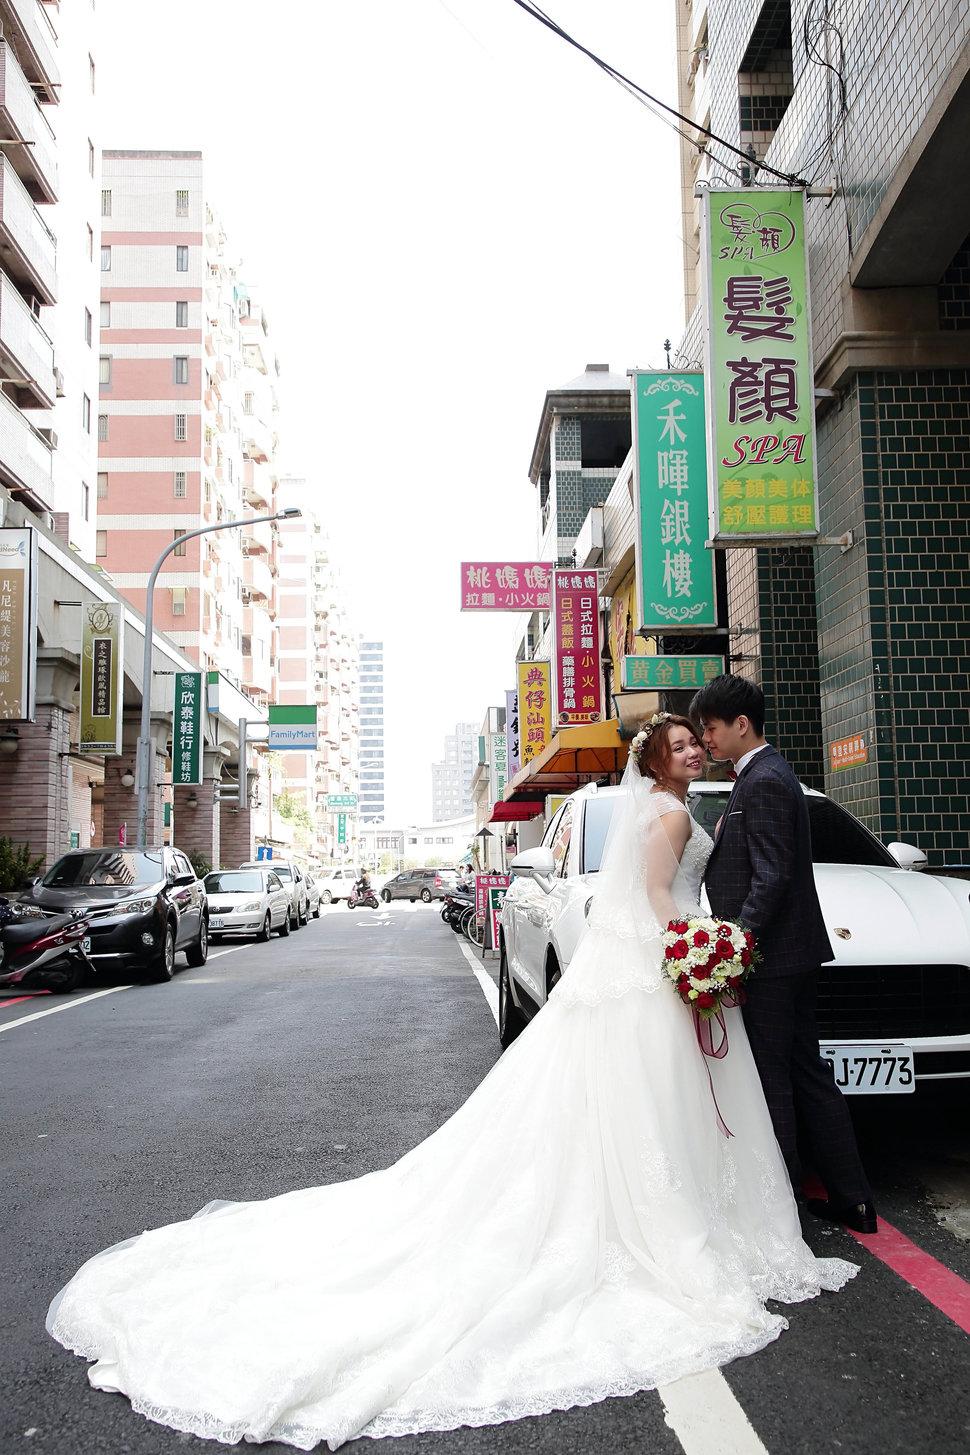 201902230220 - Loveliness ♥ wedding - 結婚吧